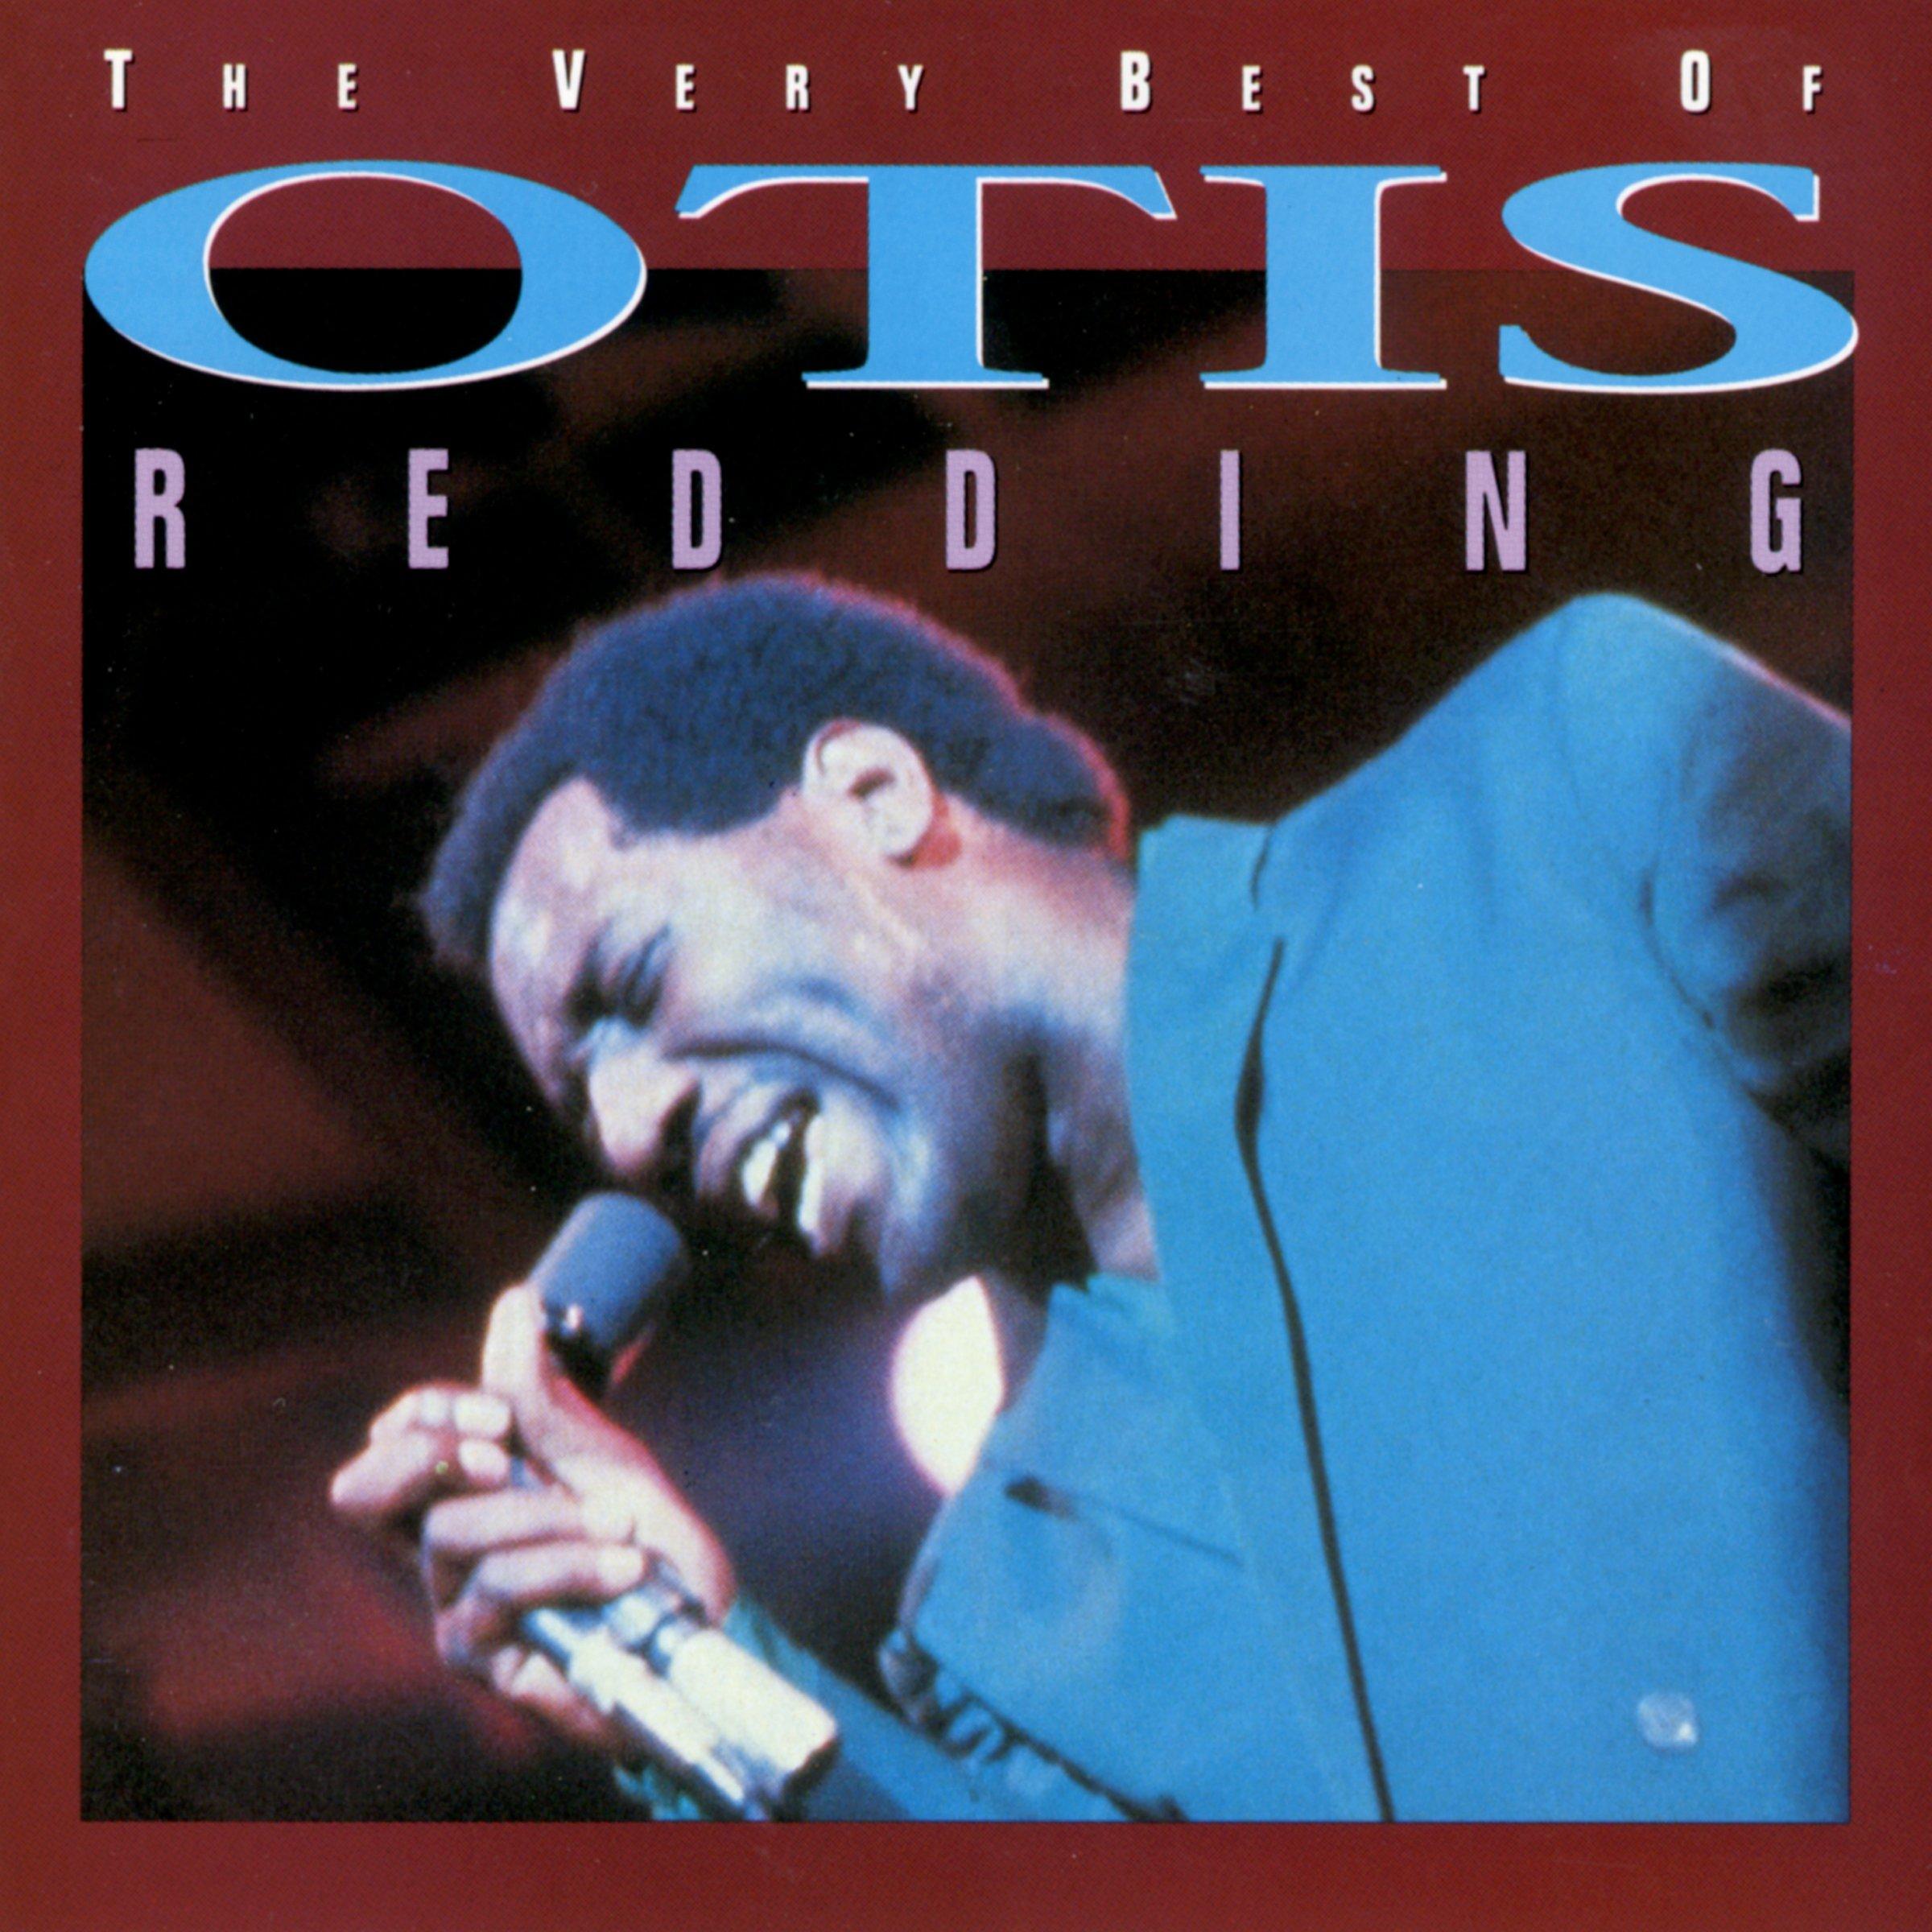 Very Best Of Otis Redding by SH123